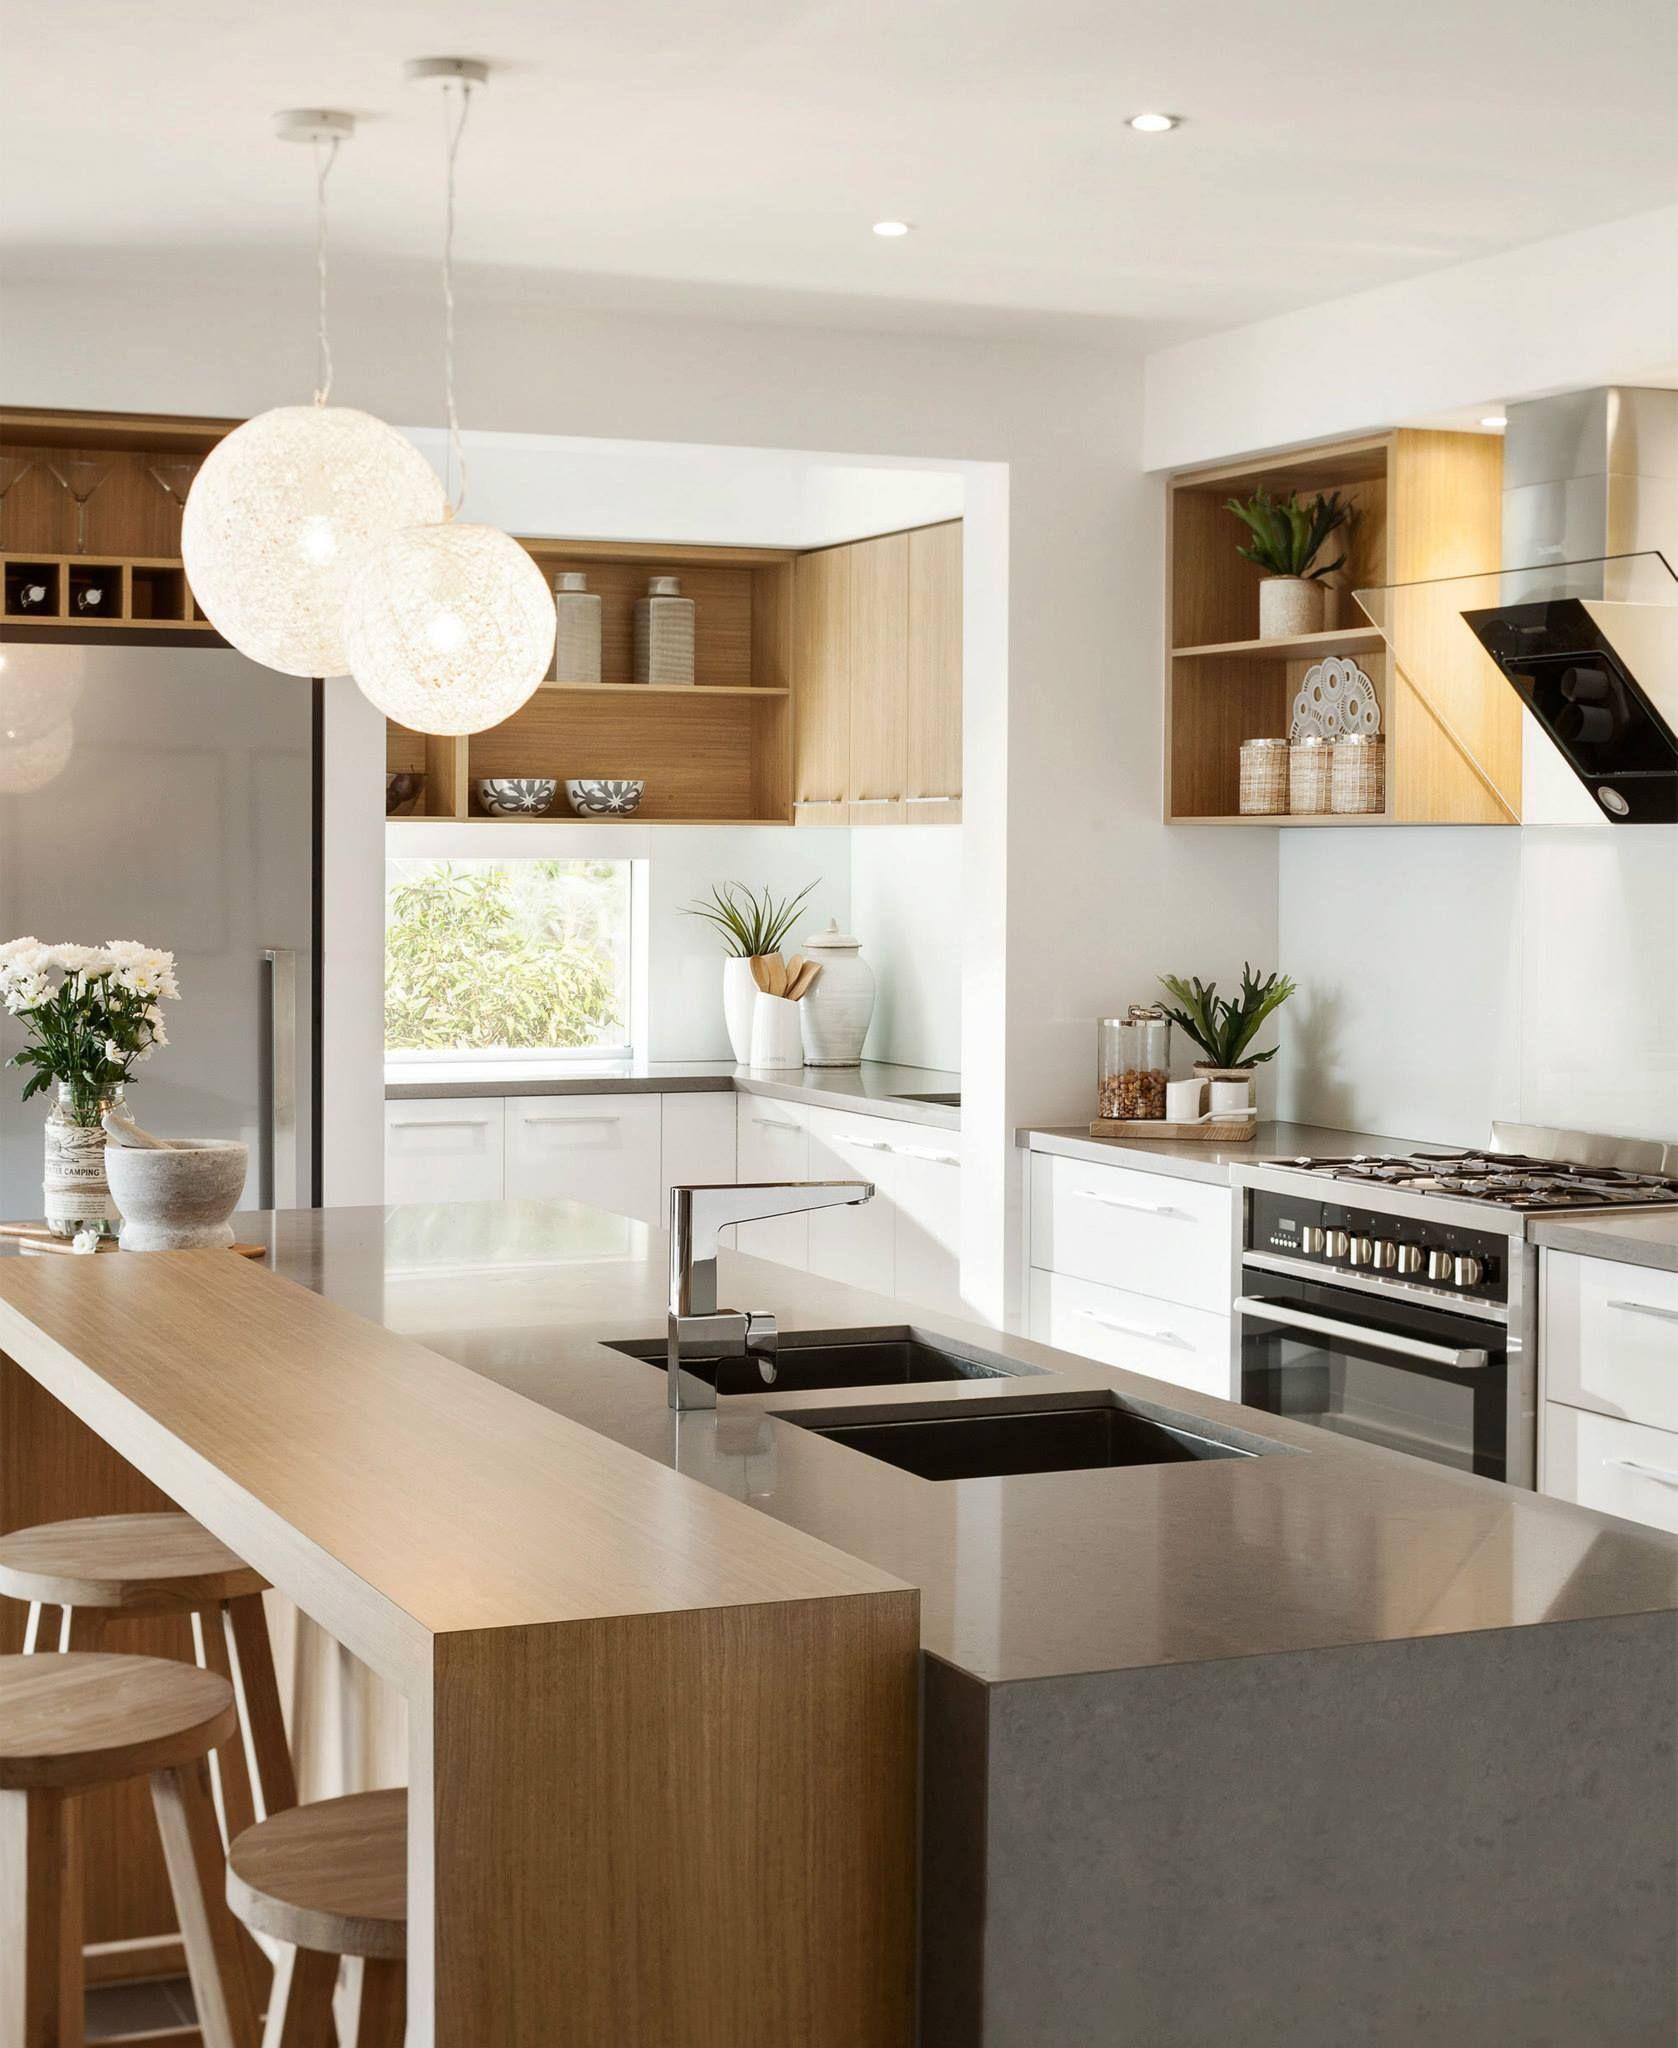 Laminex Sublime Teak In Kitchens - Google Search